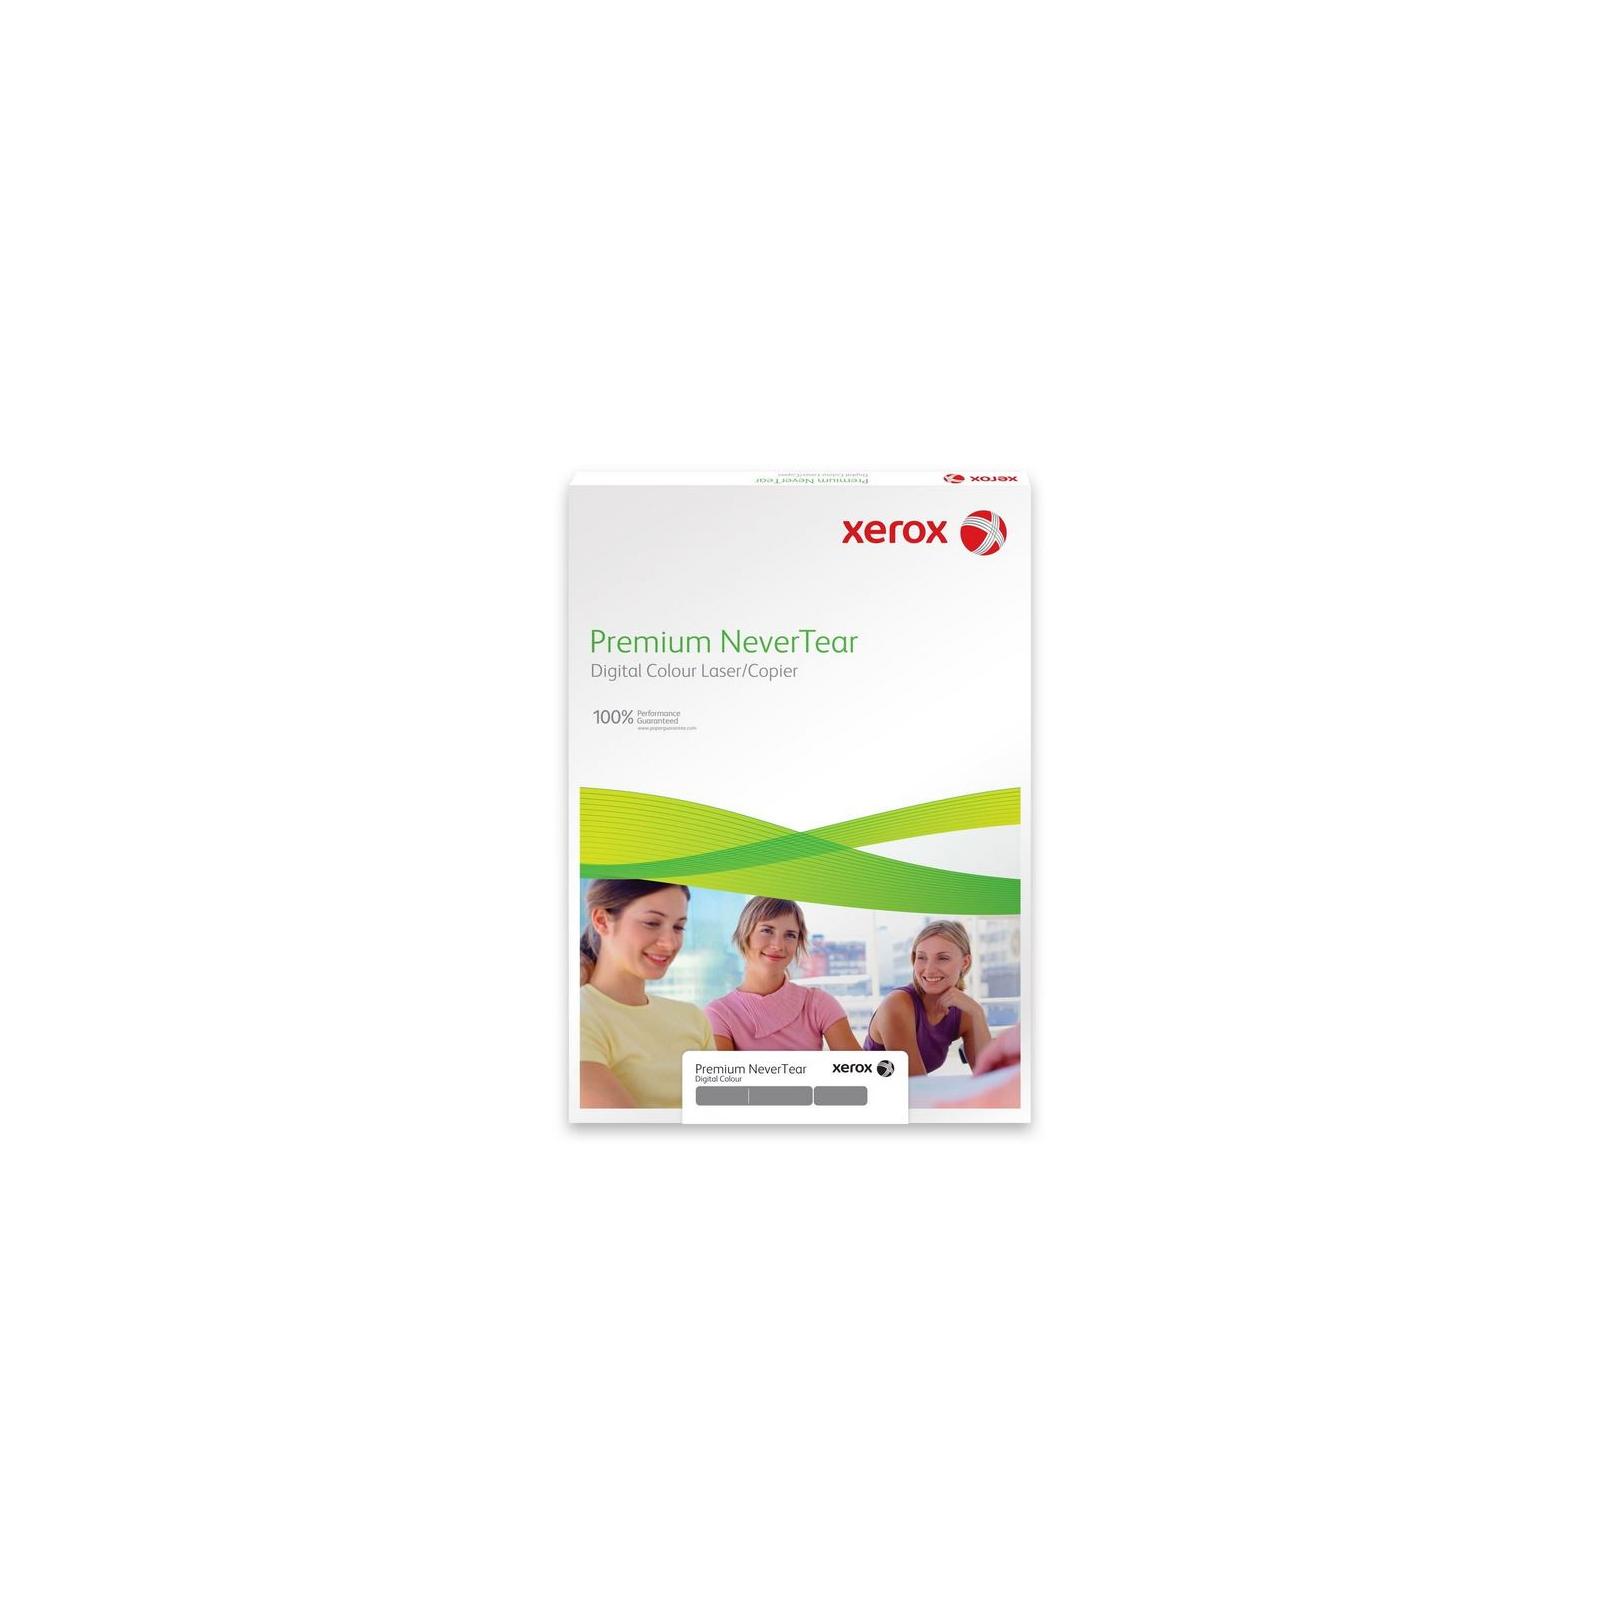 Бумага XEROX A3 Premium Never Tear 195mc (100 л) (003R98054)